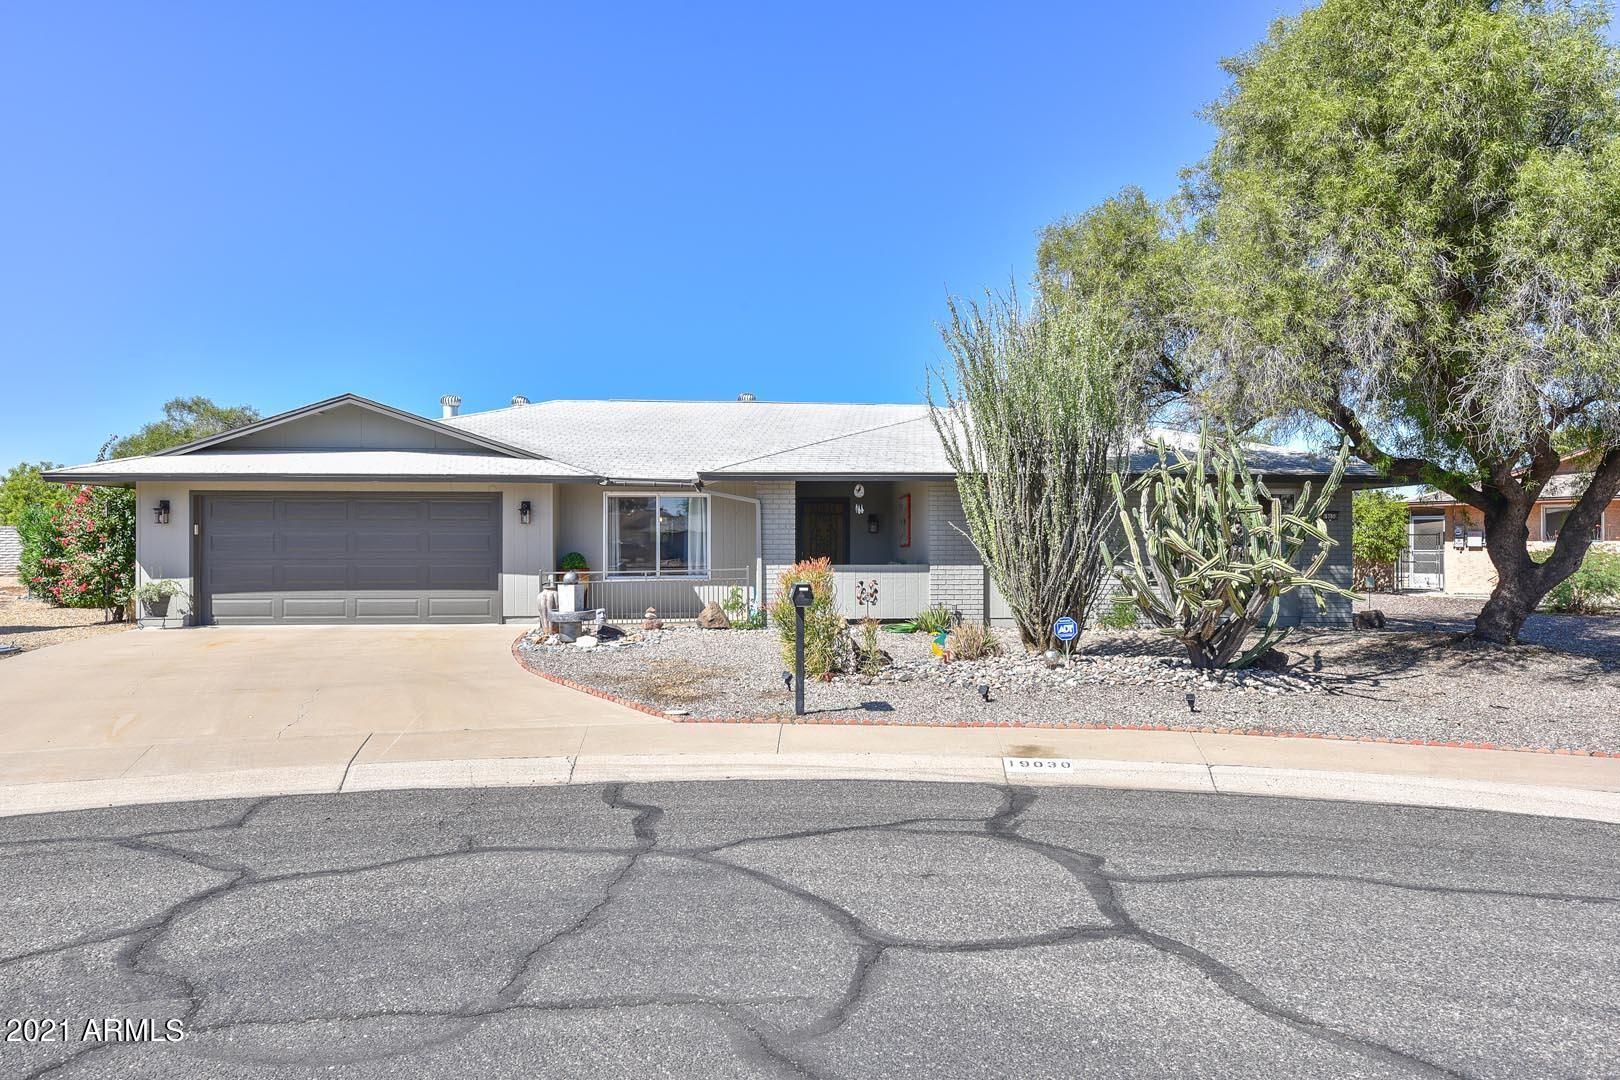 Photo of 19030 N WELK Drive, Sun City, AZ 85373 (MLS # 6305423)